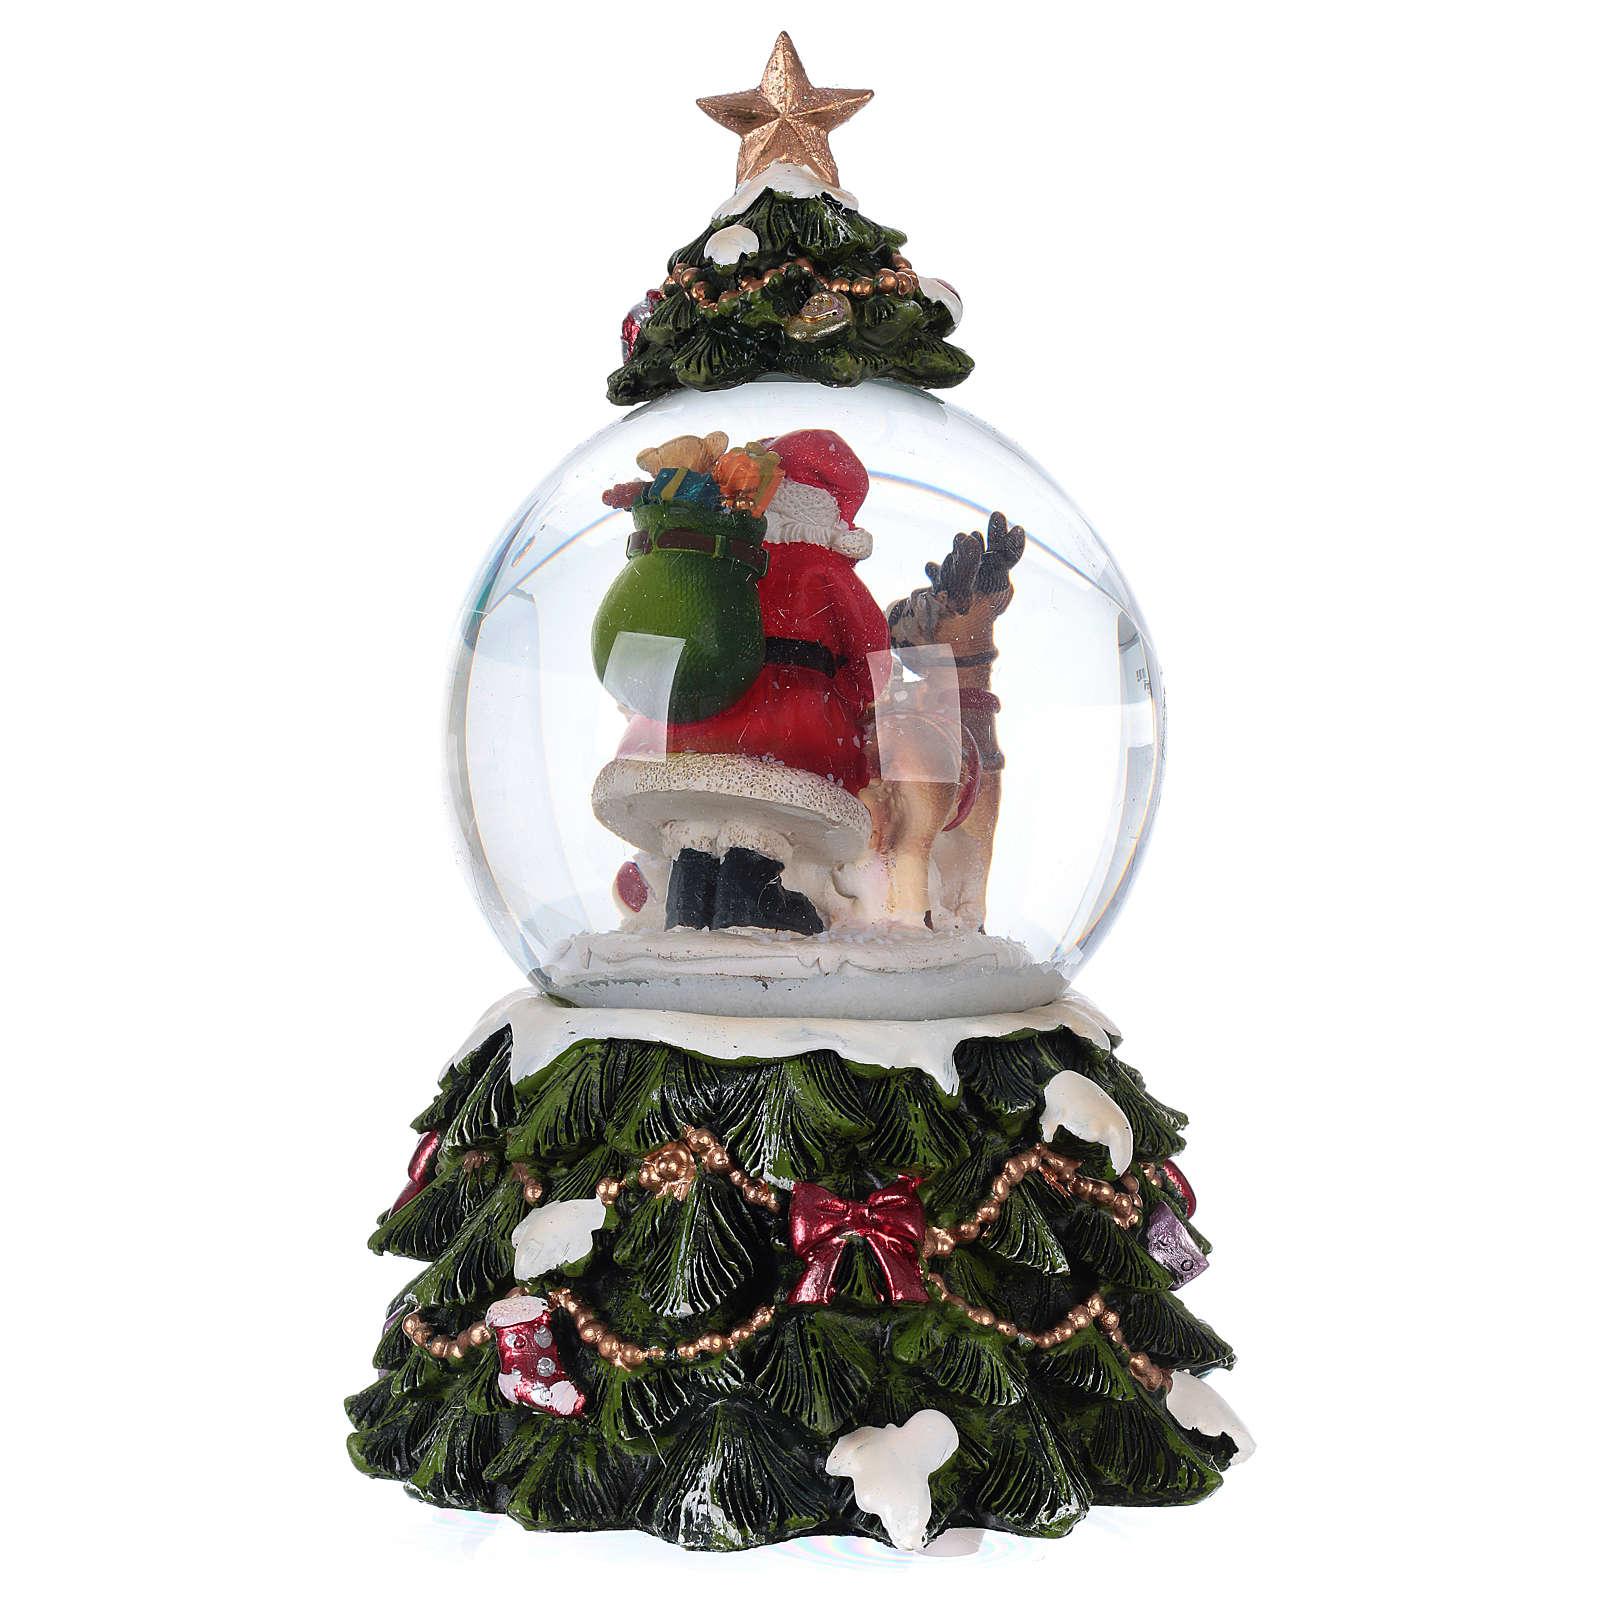 Palla vetro neve Babbo Natale renna camino musica e glitter 3